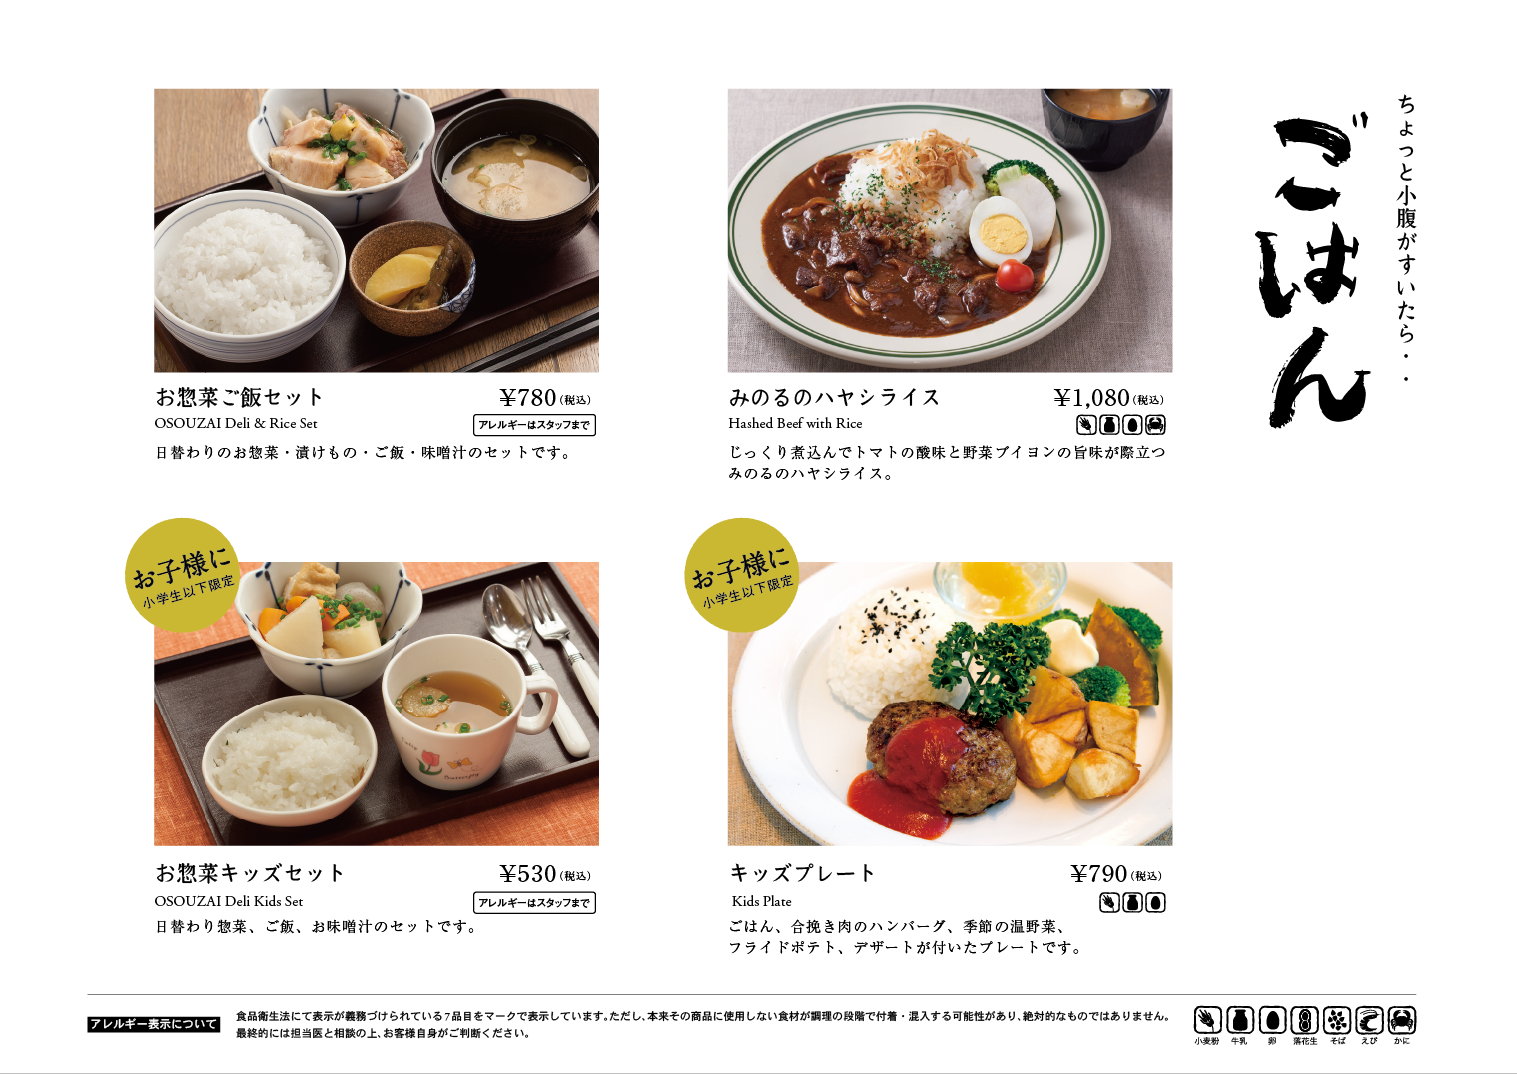 縺ソ縺ョ繧・minoru_oyatsu_menu_1806_08.png